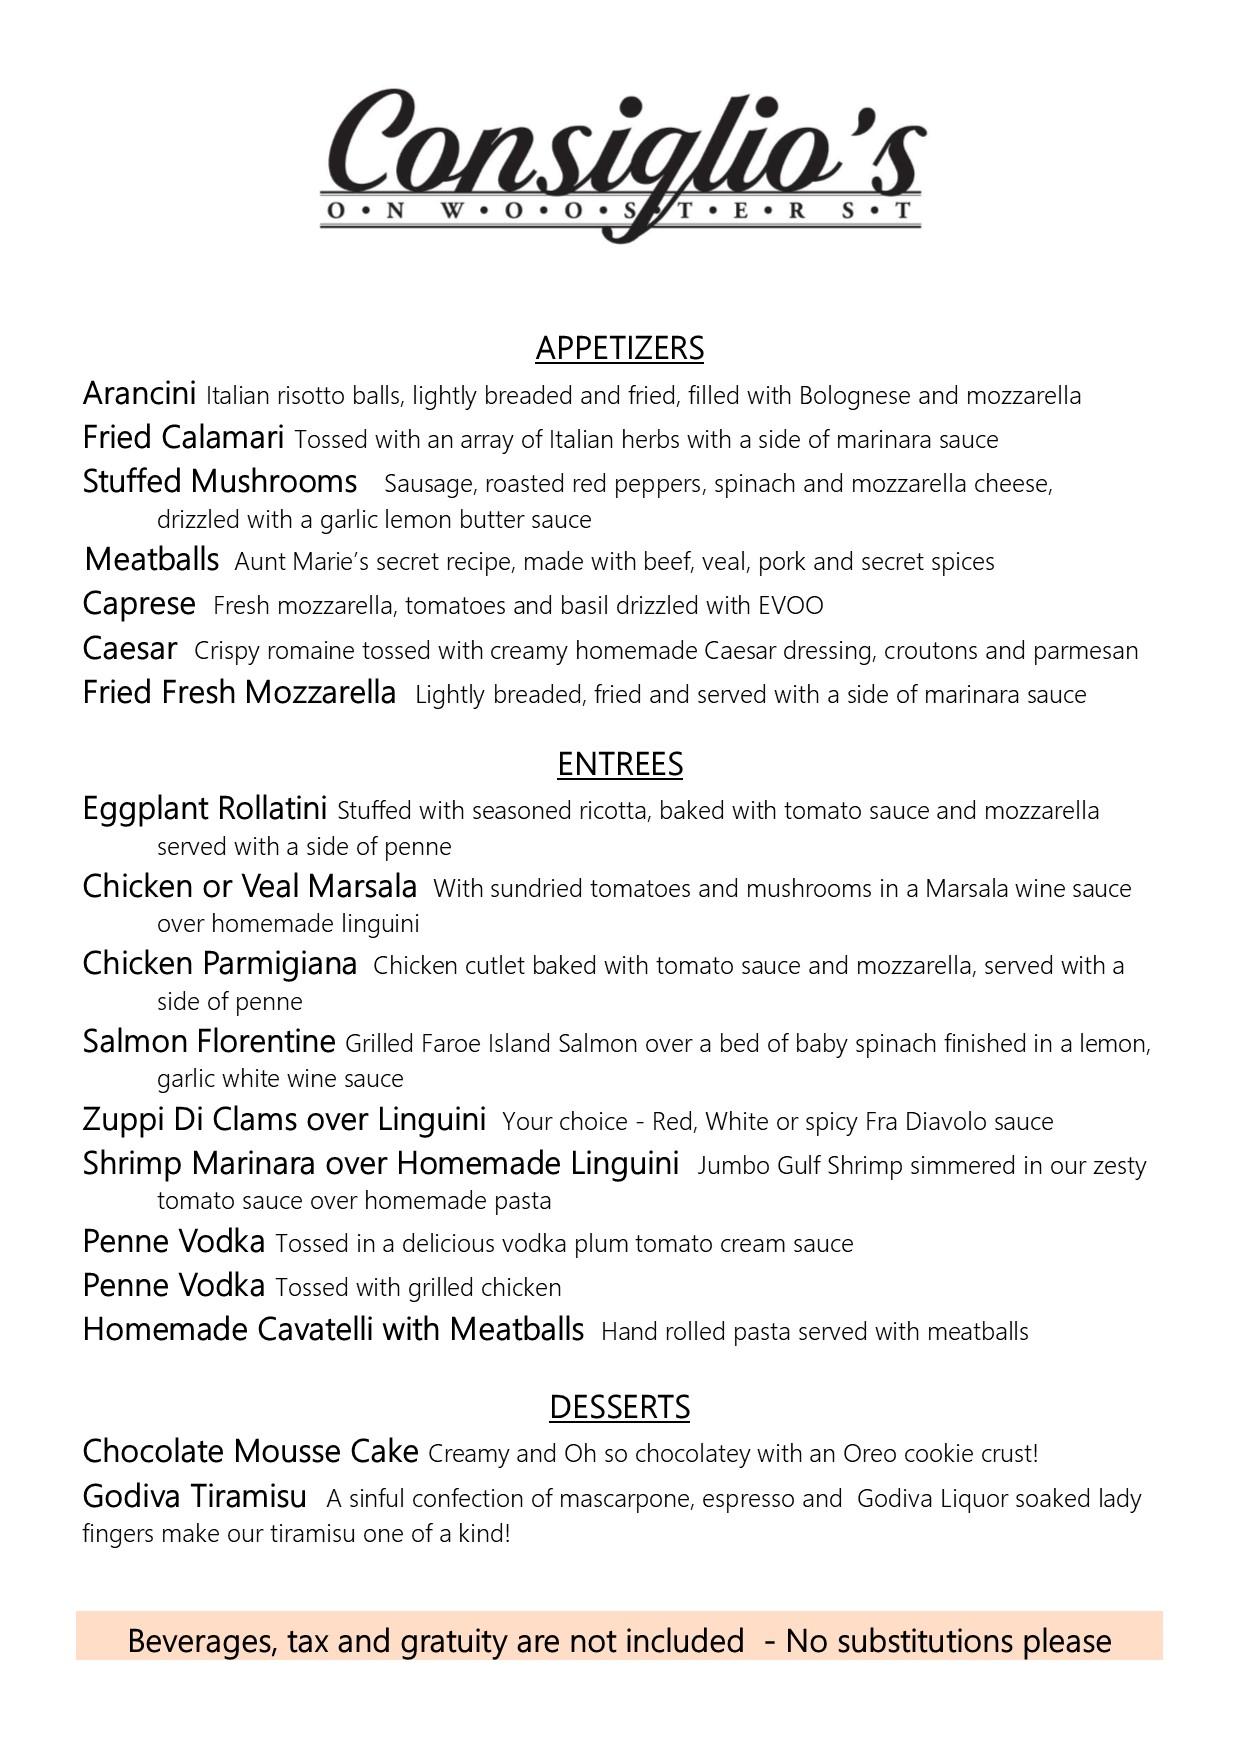 Dinner Theatre Prix Fixe menu dinner only 2017.jpg